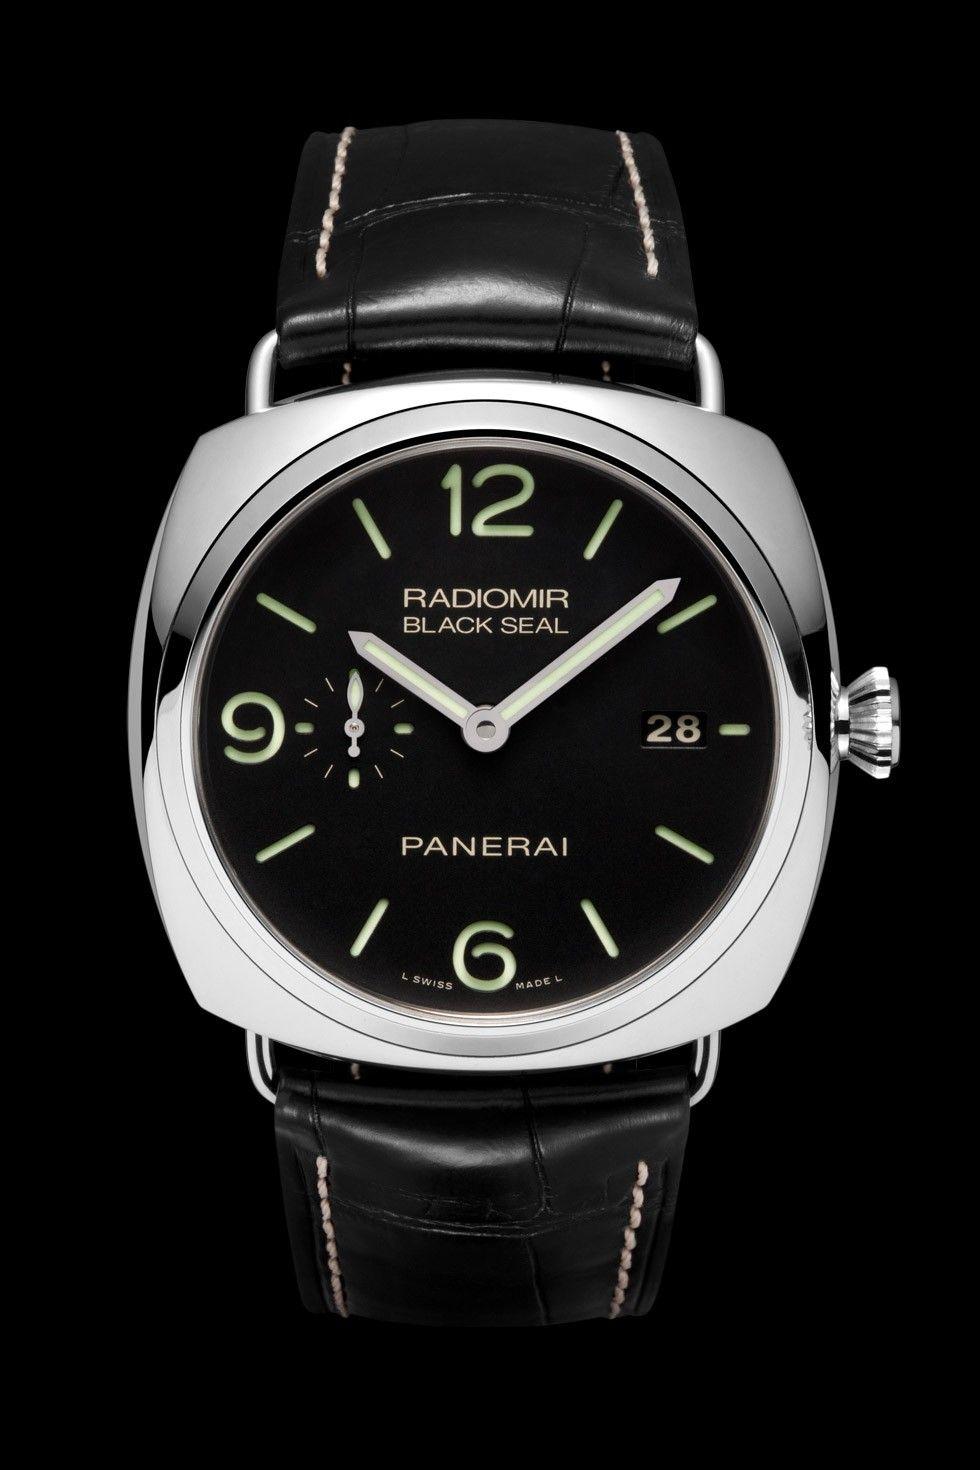 826a086ee69fd Panerai Radiomir Blackseal 3 Days PAM00388